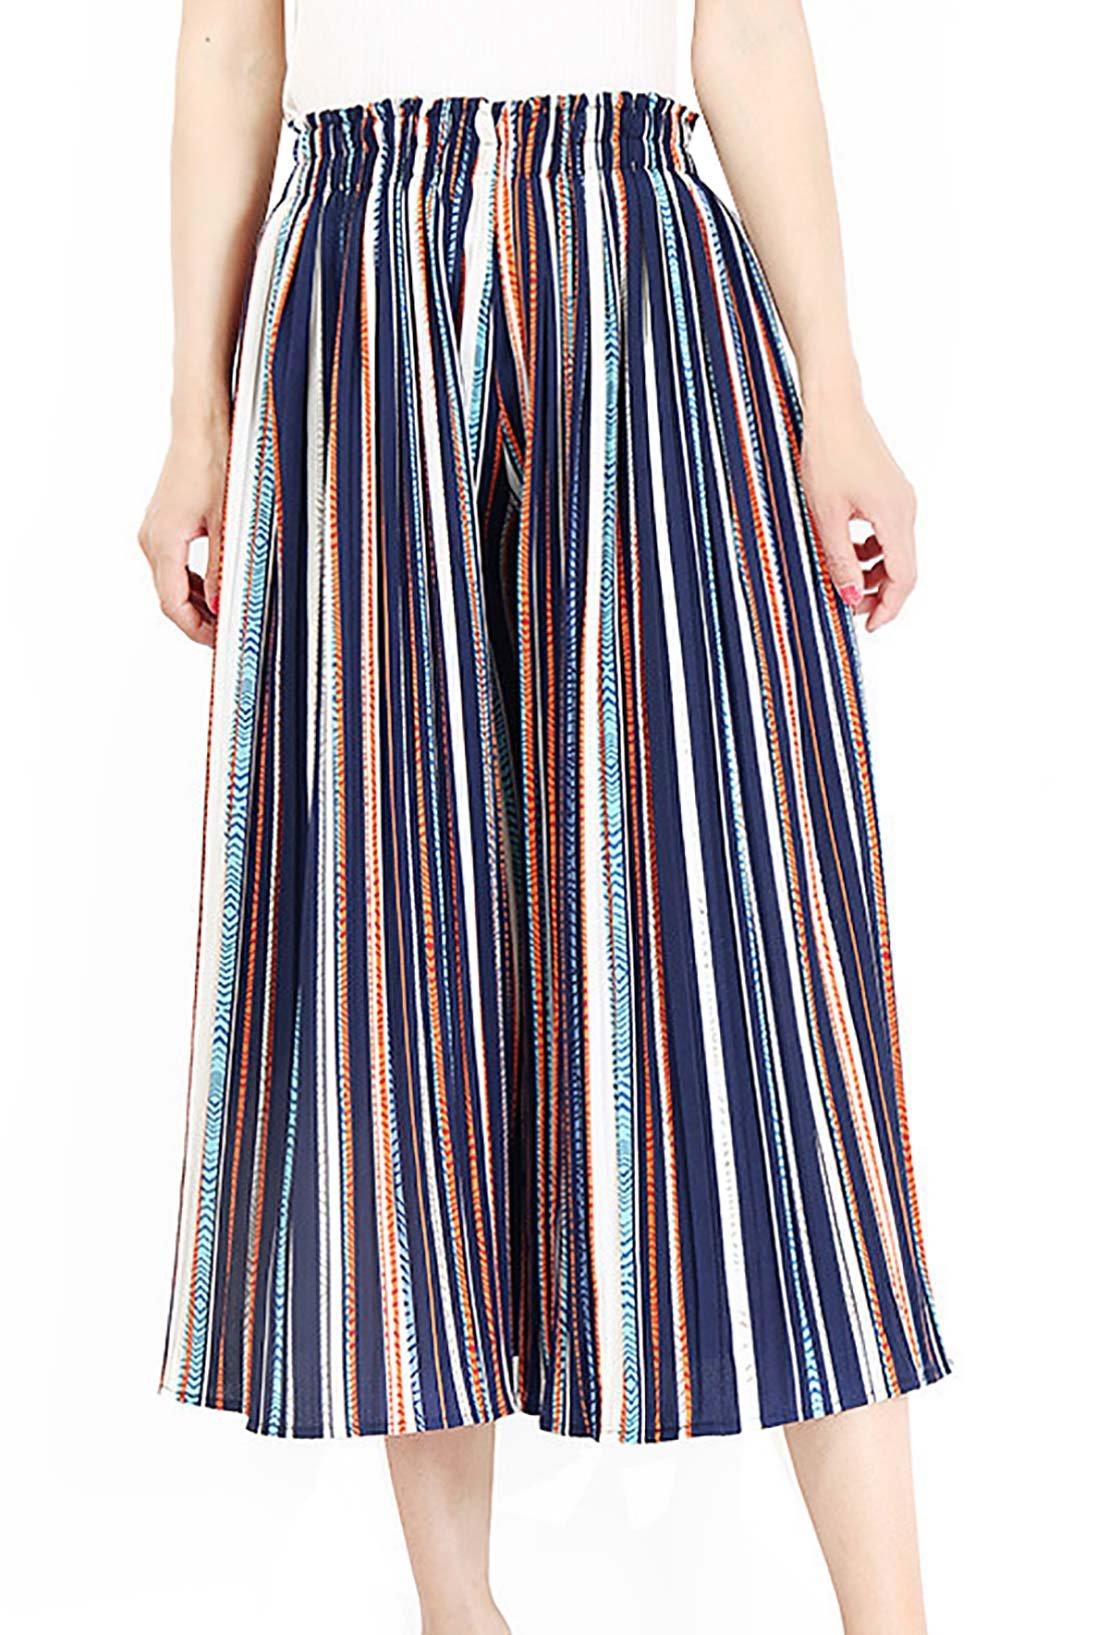 FEOYA Womens Strips Wide Leg Pants Casual Light Palazzo Pants Chic Comfy Strips Elastic High Waist Trouser Pants for Women Large - Blue